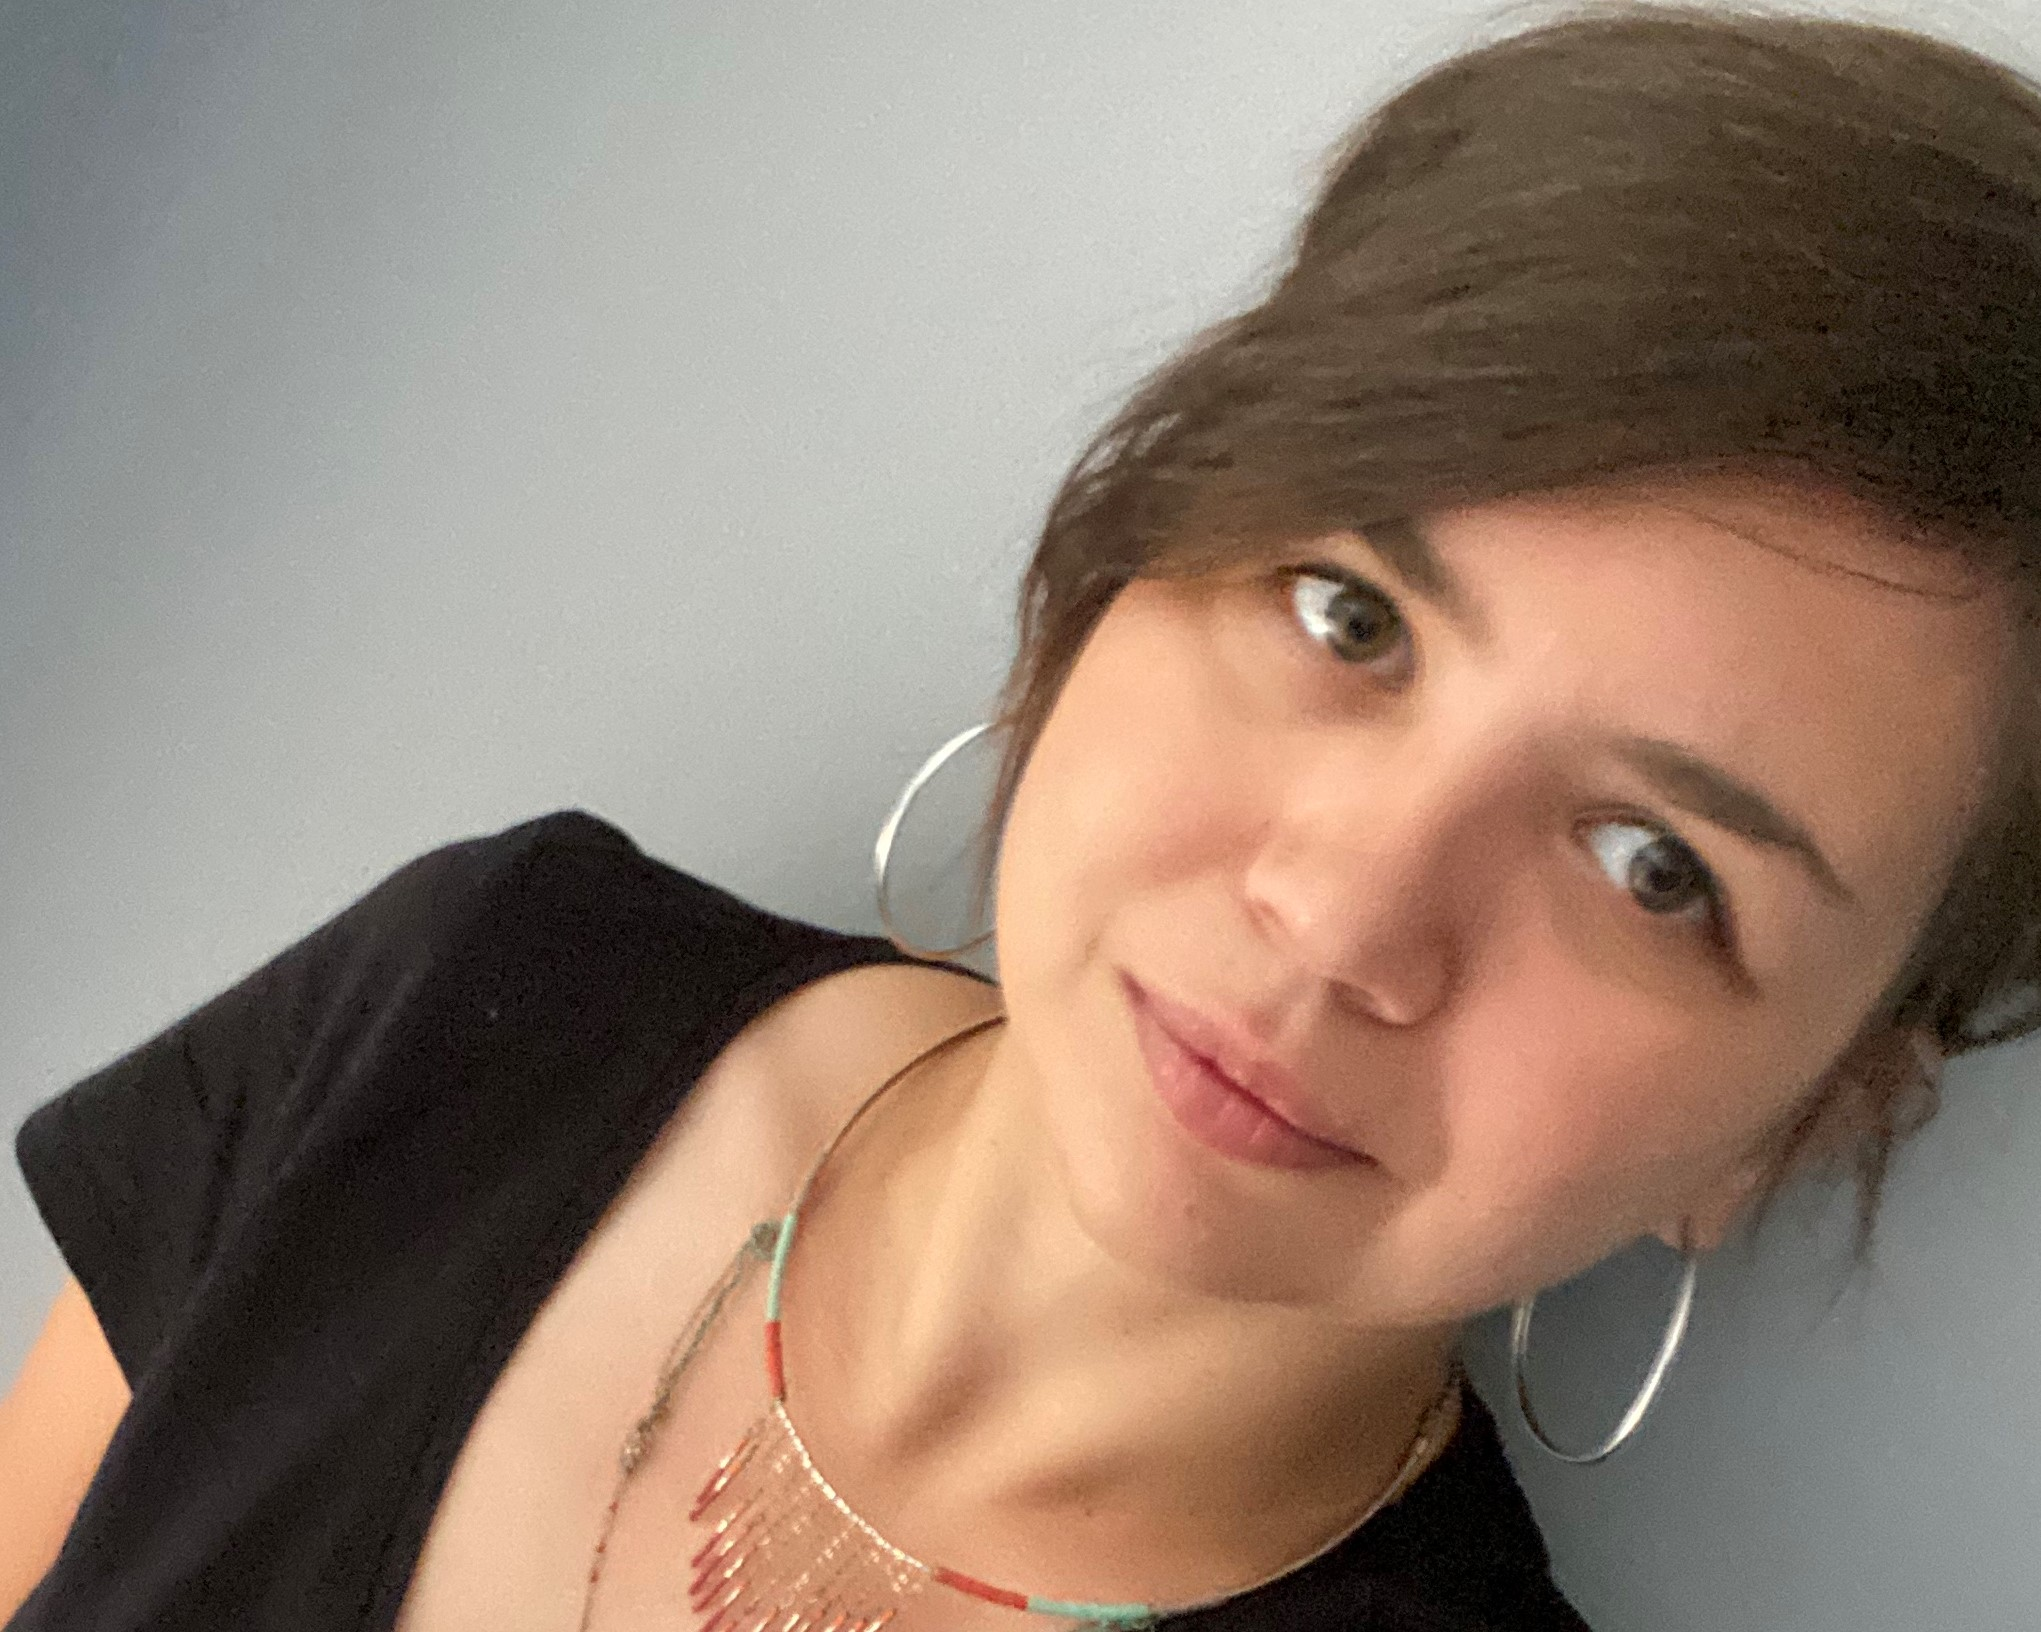 Aneta Czarnowska